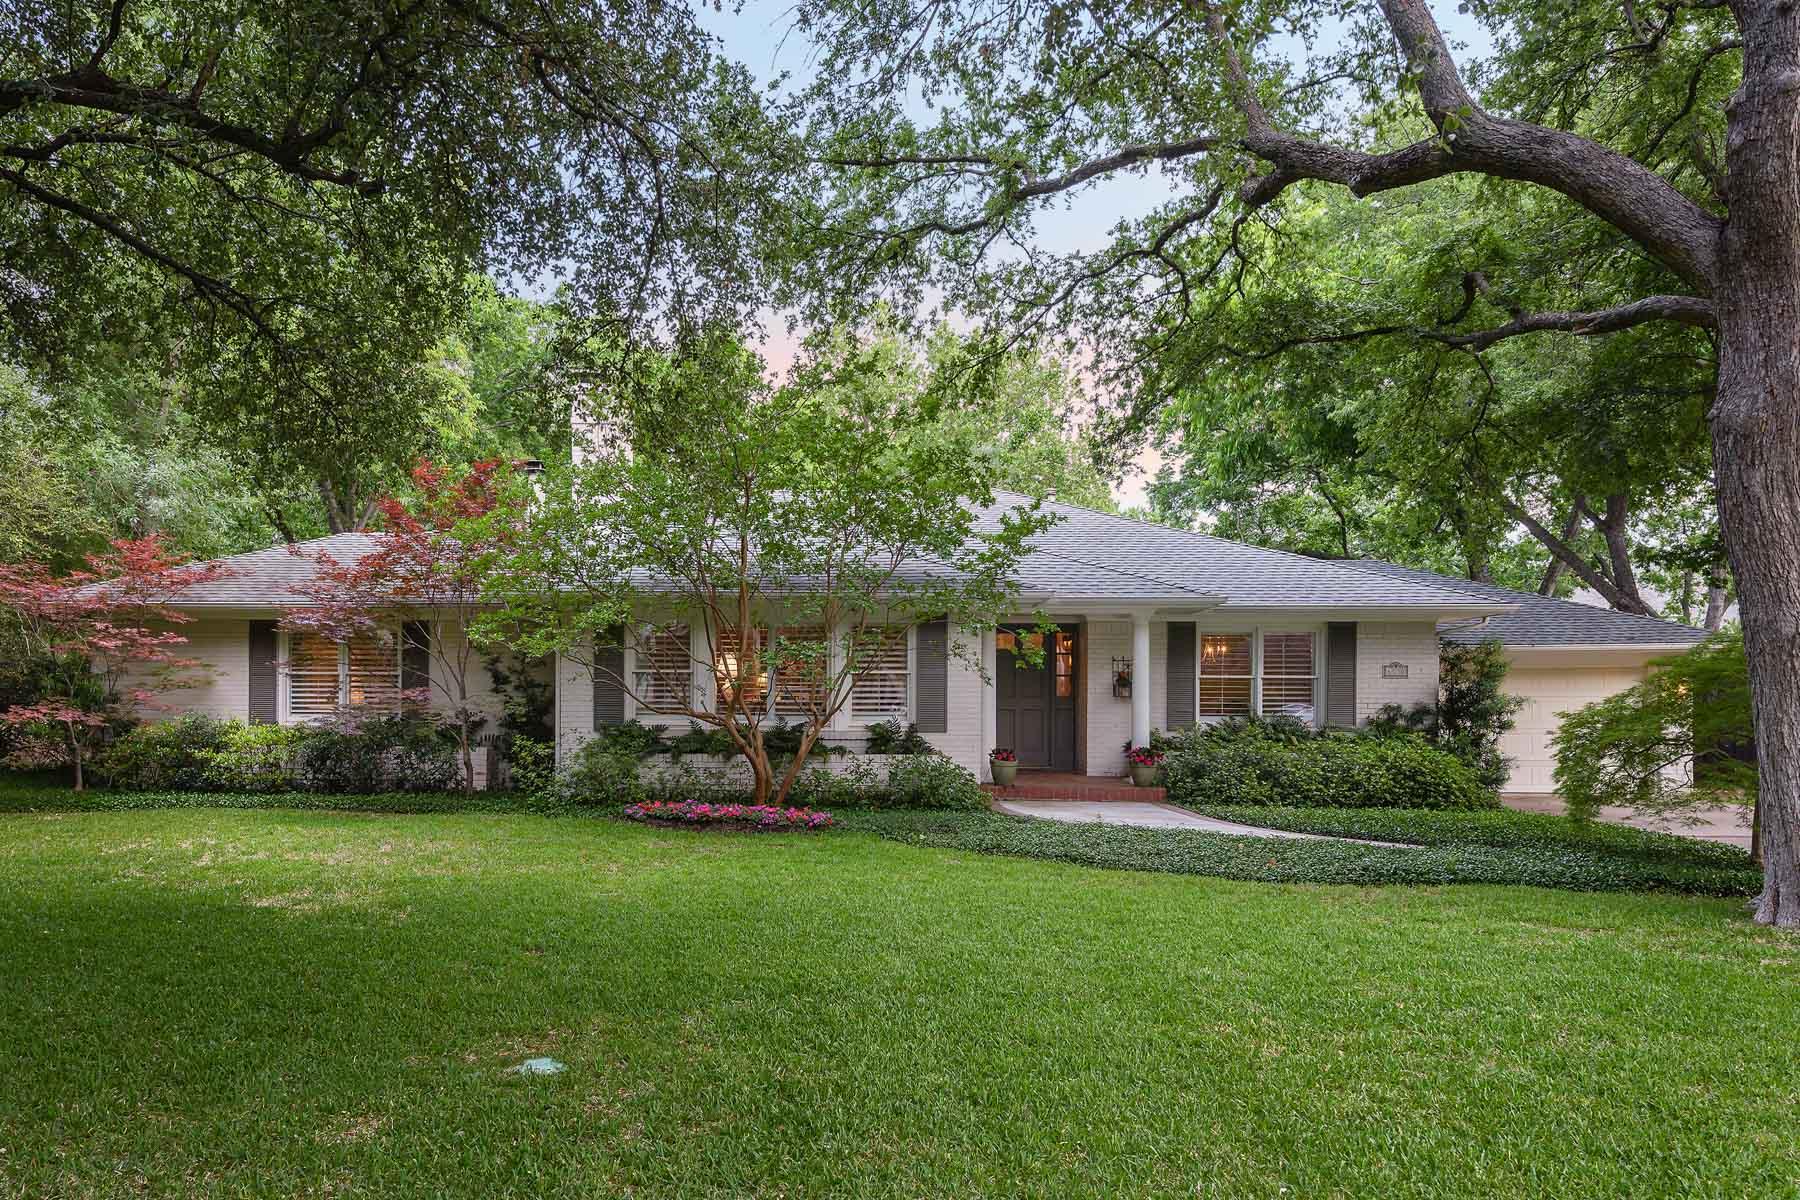 獨棟家庭住宅 為 出售 在 Preston Hollow Traditional Ranch-Style 6530 Desco Dr Dallas, 德克薩斯州, 75225 美國